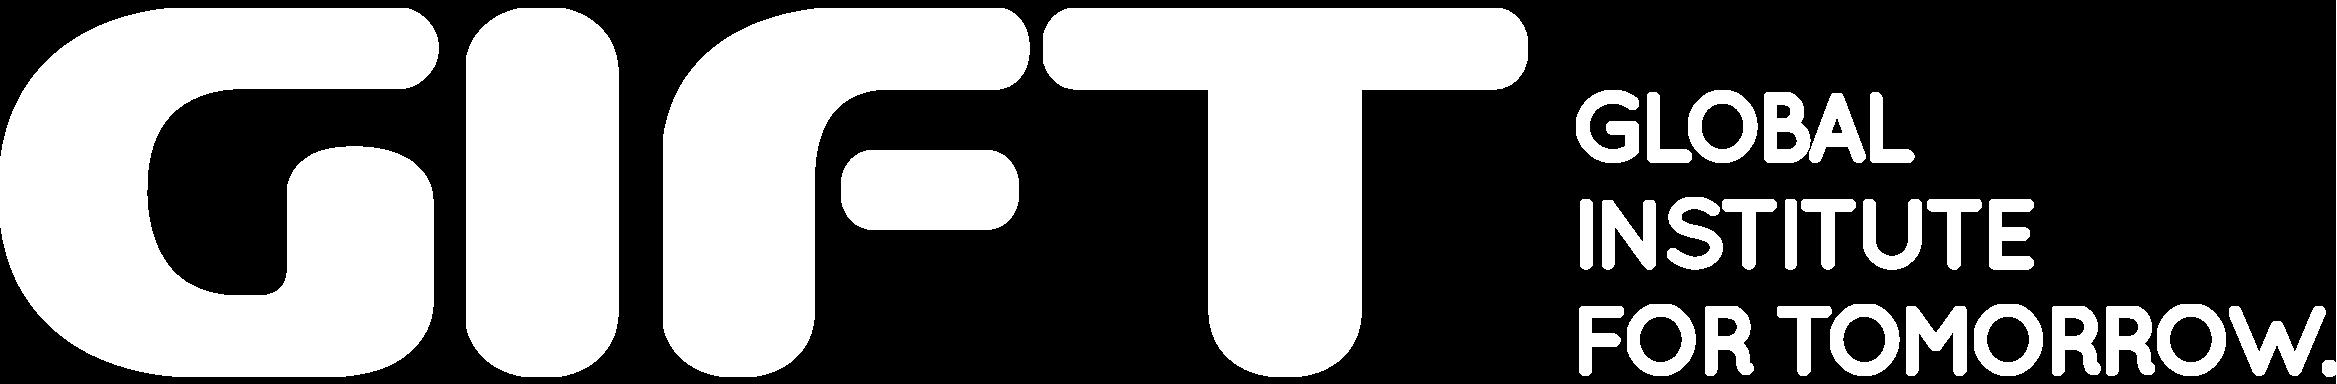 Global Institute For Tomorrow (GIFT)_White logo